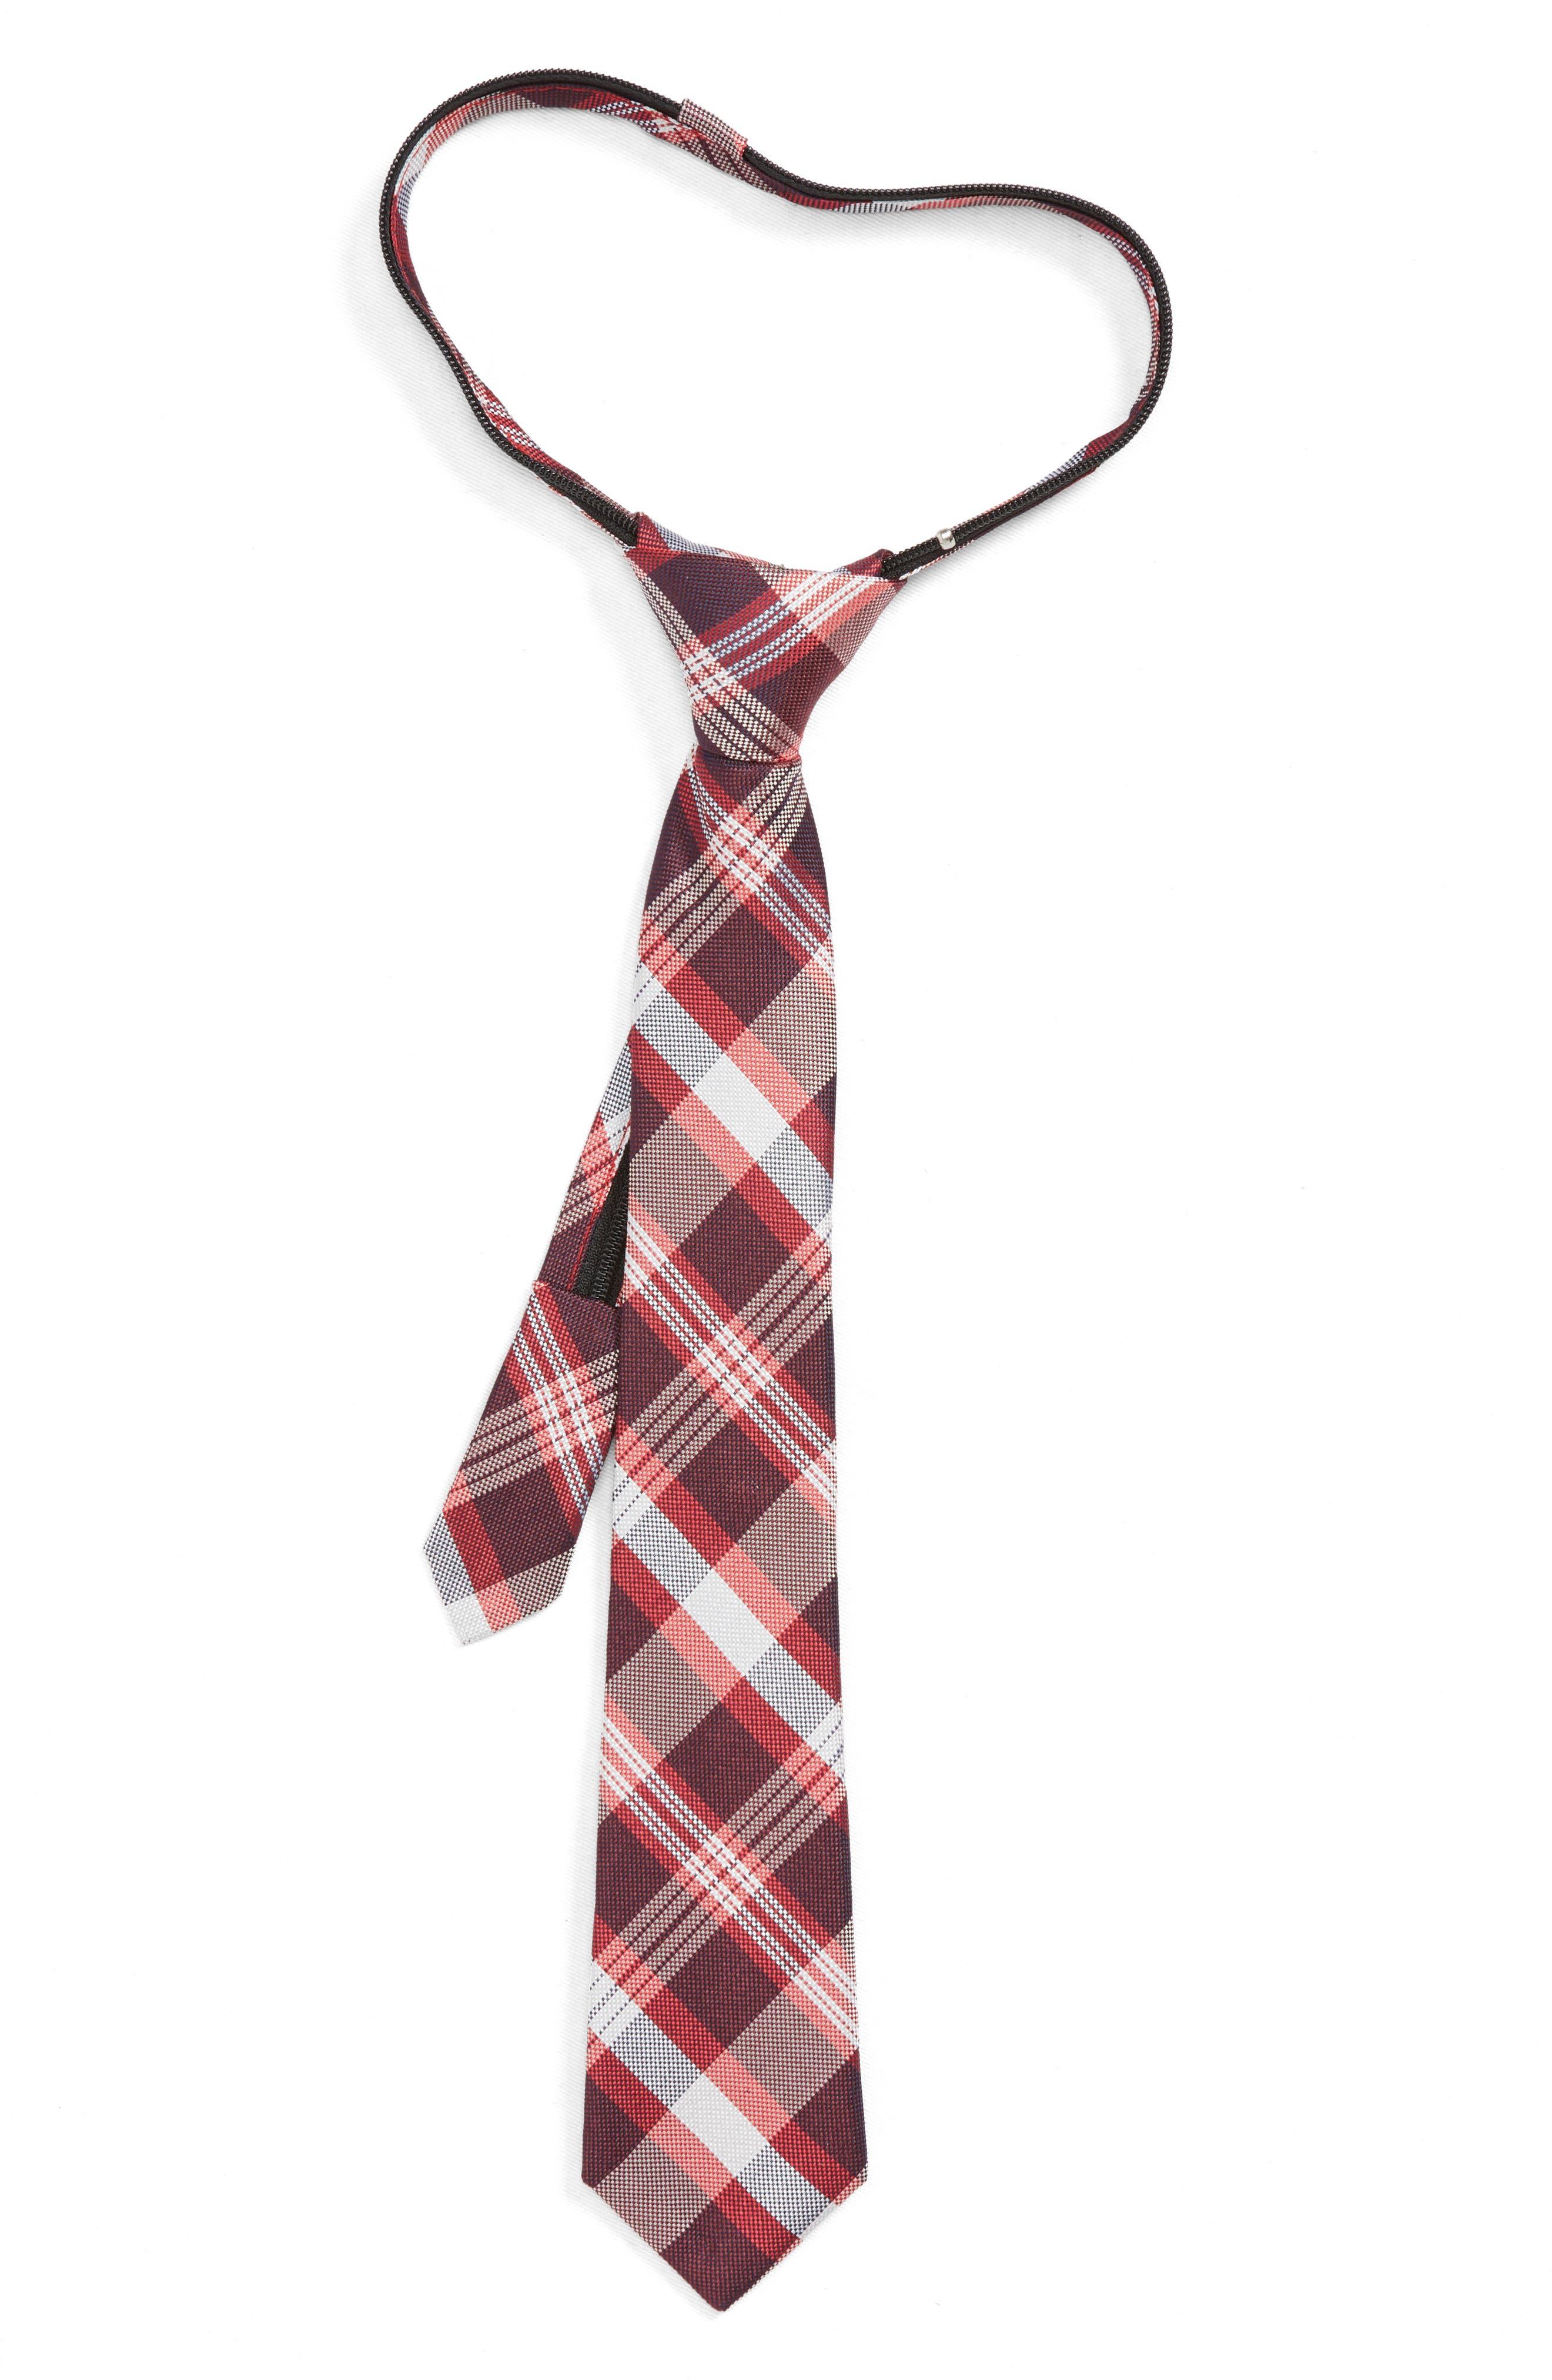 Plaid Silk Zip Tie,                             Main thumbnail 1, color,                             RED